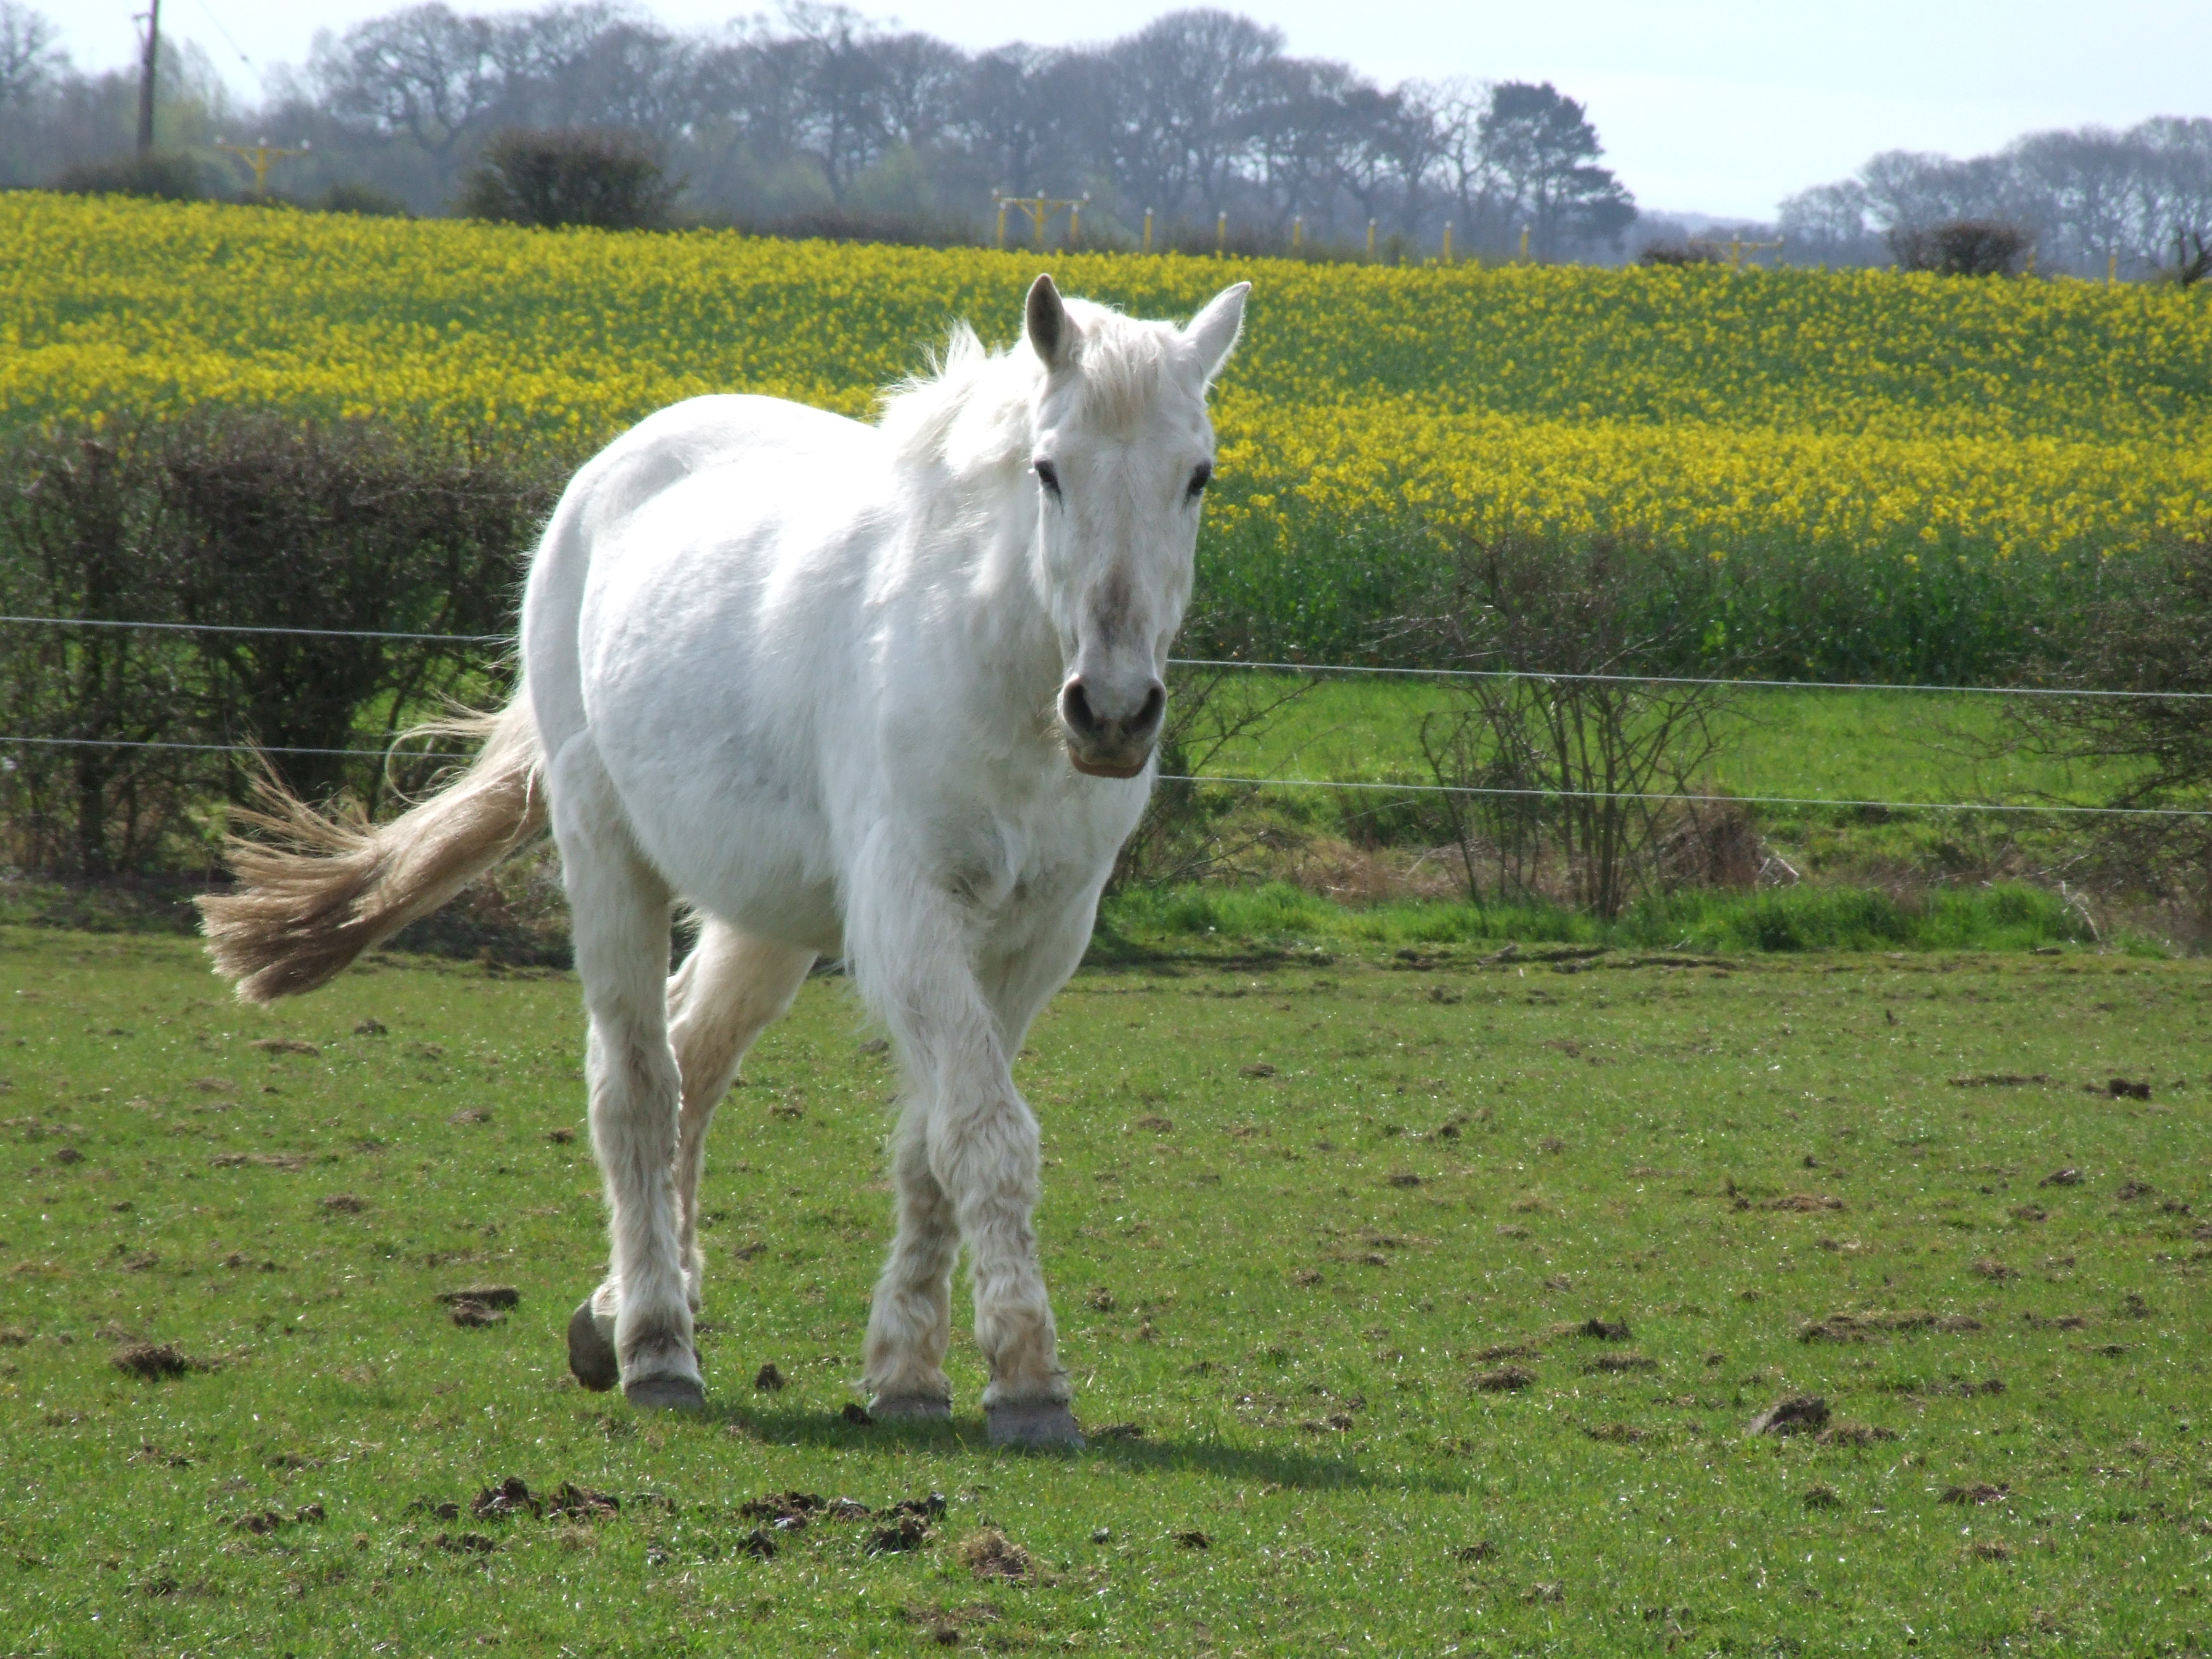 Modelo de Relaciones Stunning-White-Horse-white-34727469-3488-2616